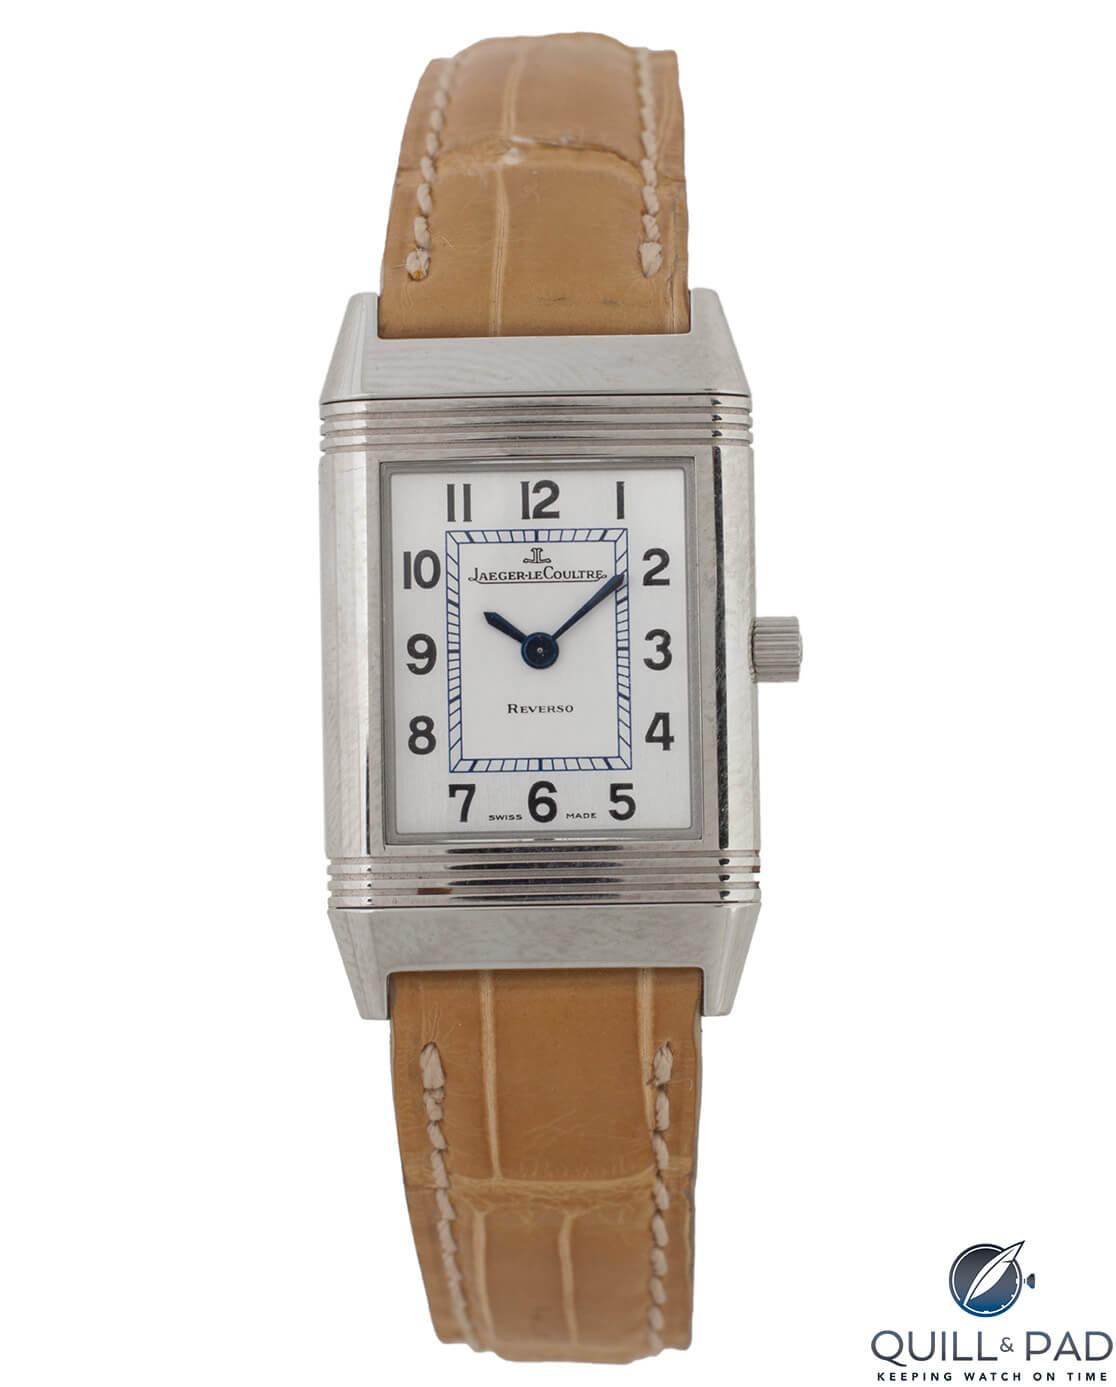 Julien's Auctions Lot 376: Jaeger-LeCoultre Reverso Reference 260808